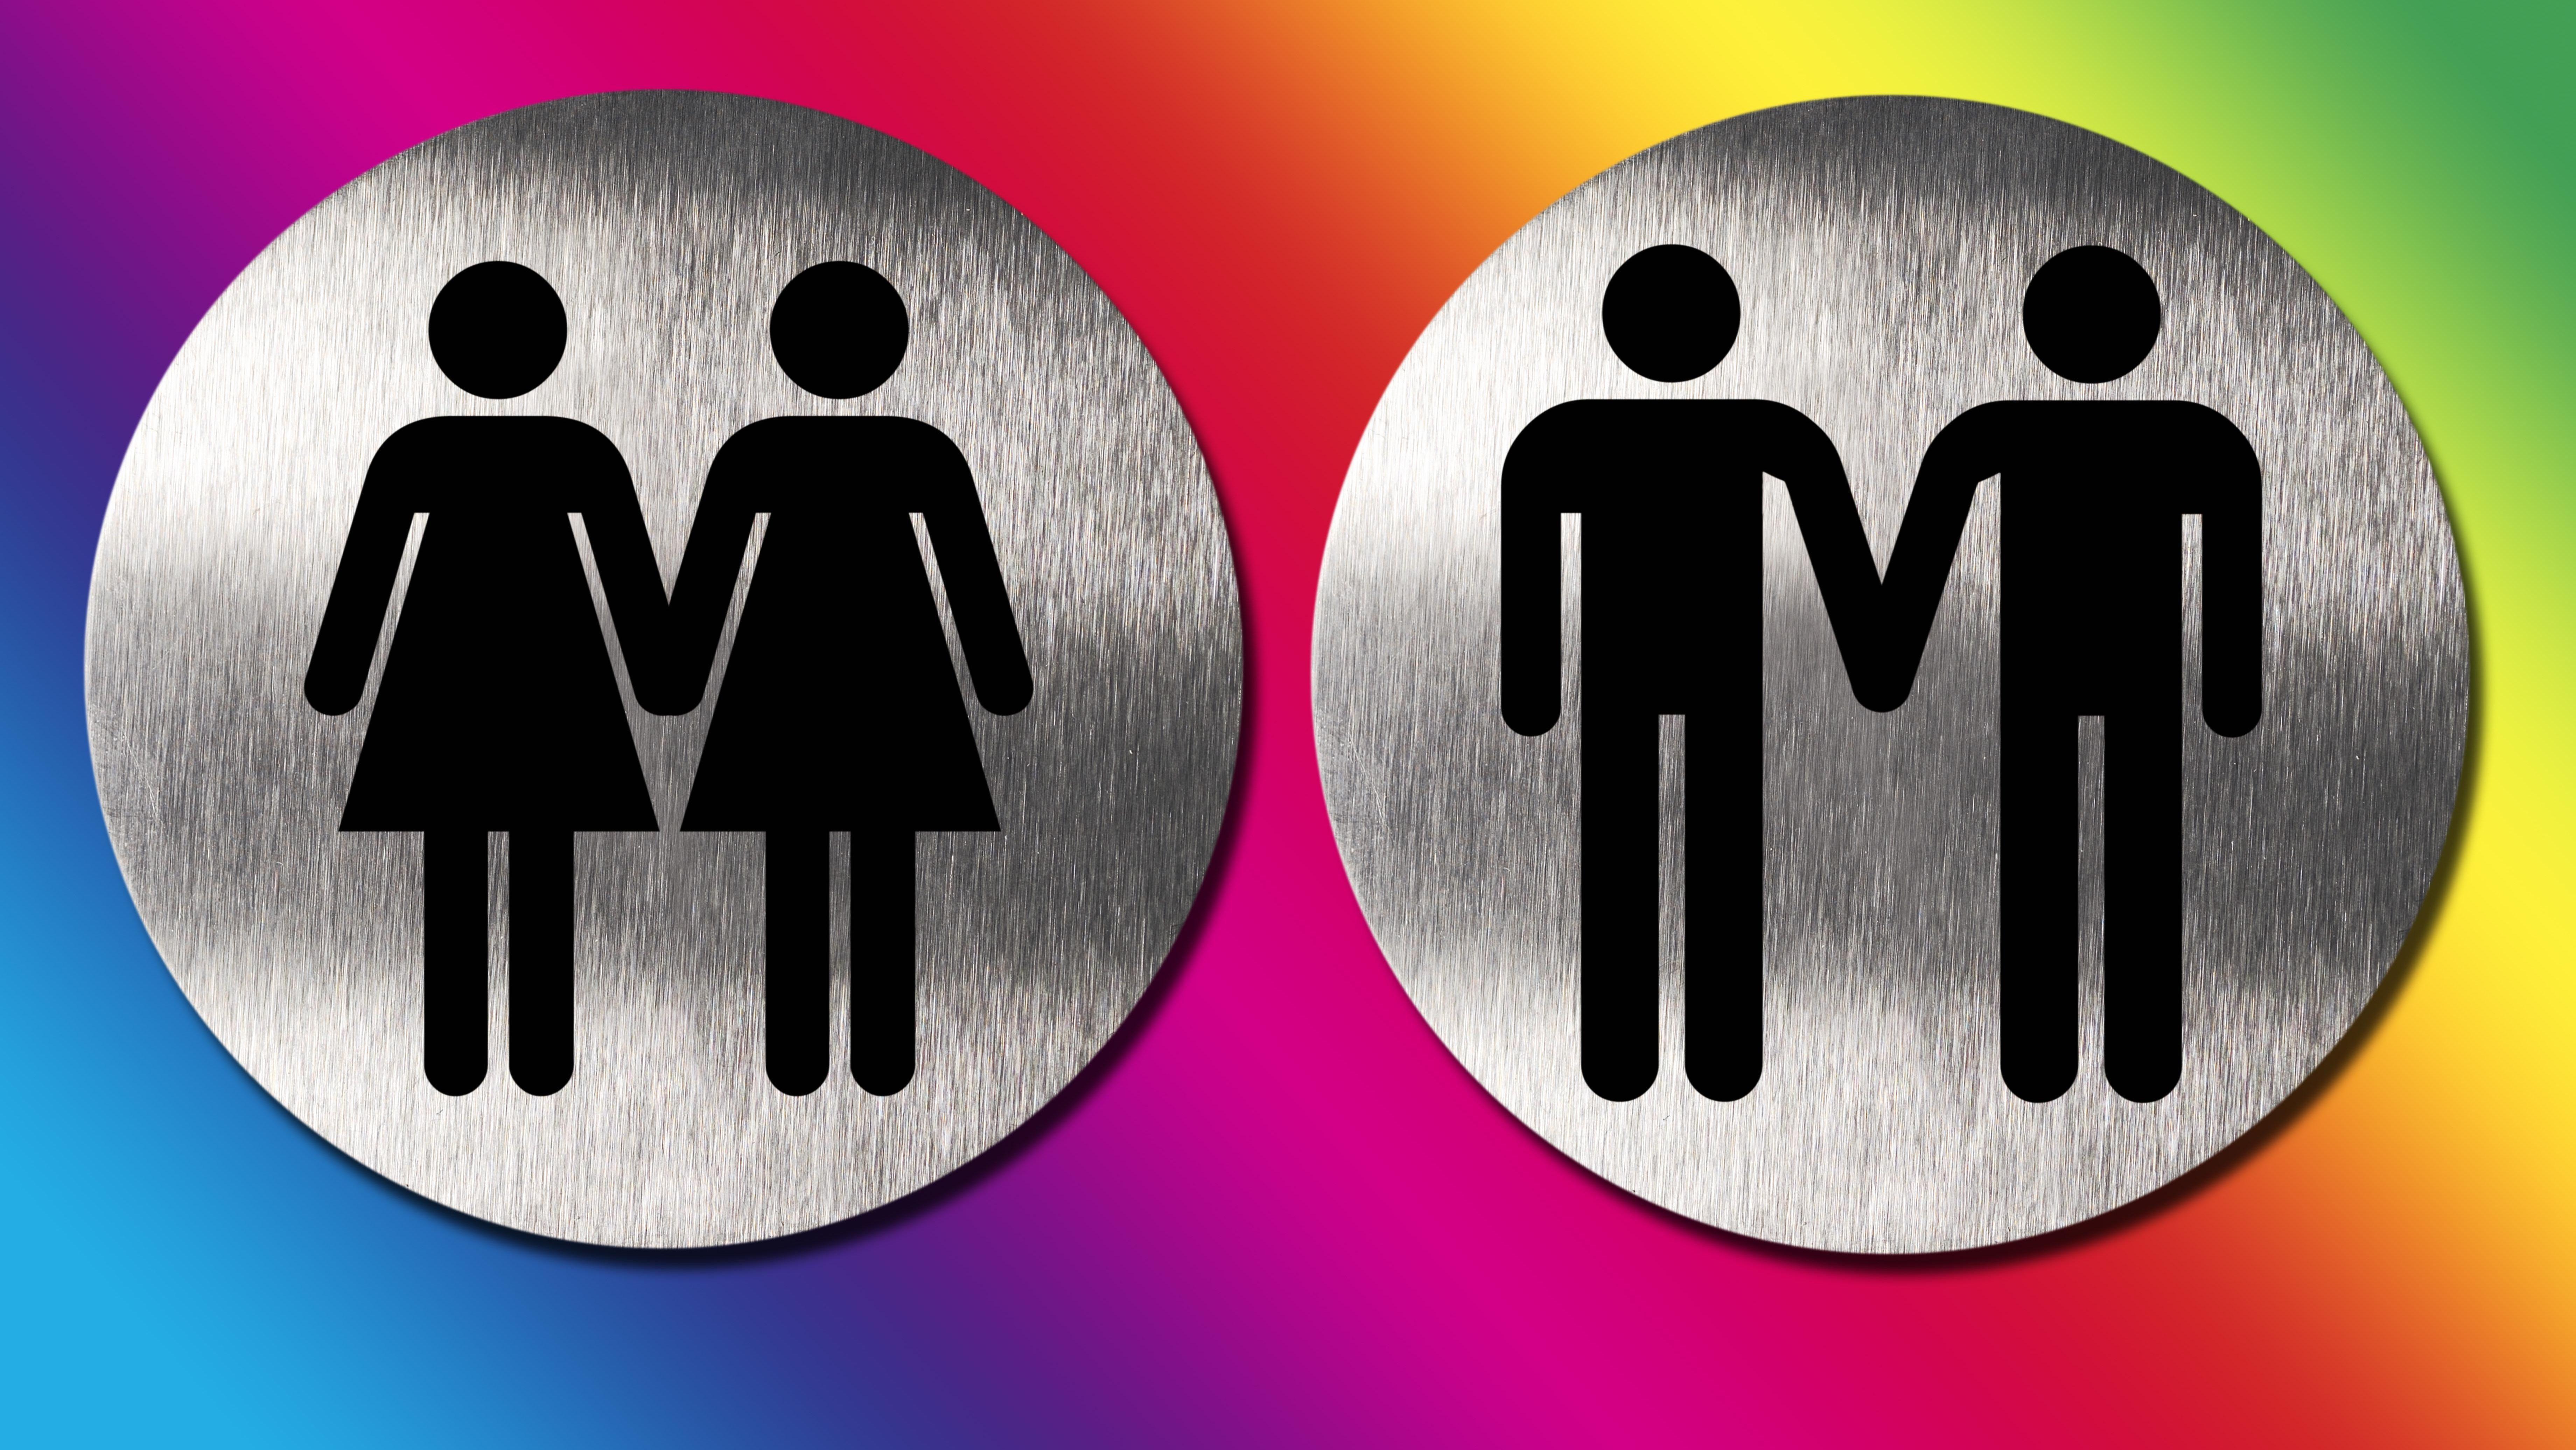 Männerpaar und Frauenpaar, Piktogramme, Symbolbild.